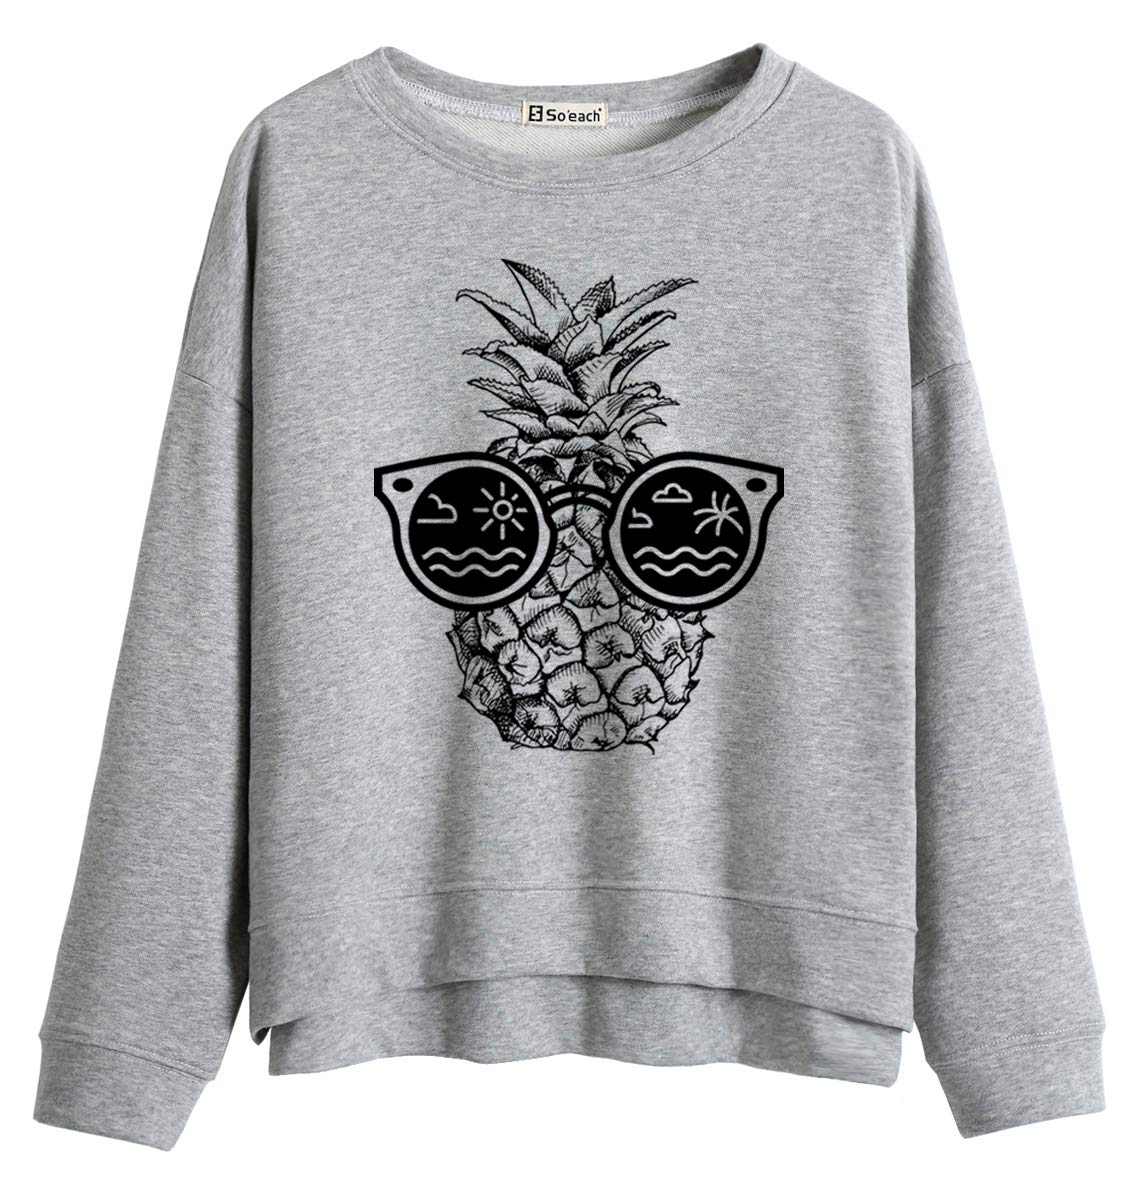 So'each Women Jumper Sweatshirt Sunglasses Pineapple Graphic Words Print Grey